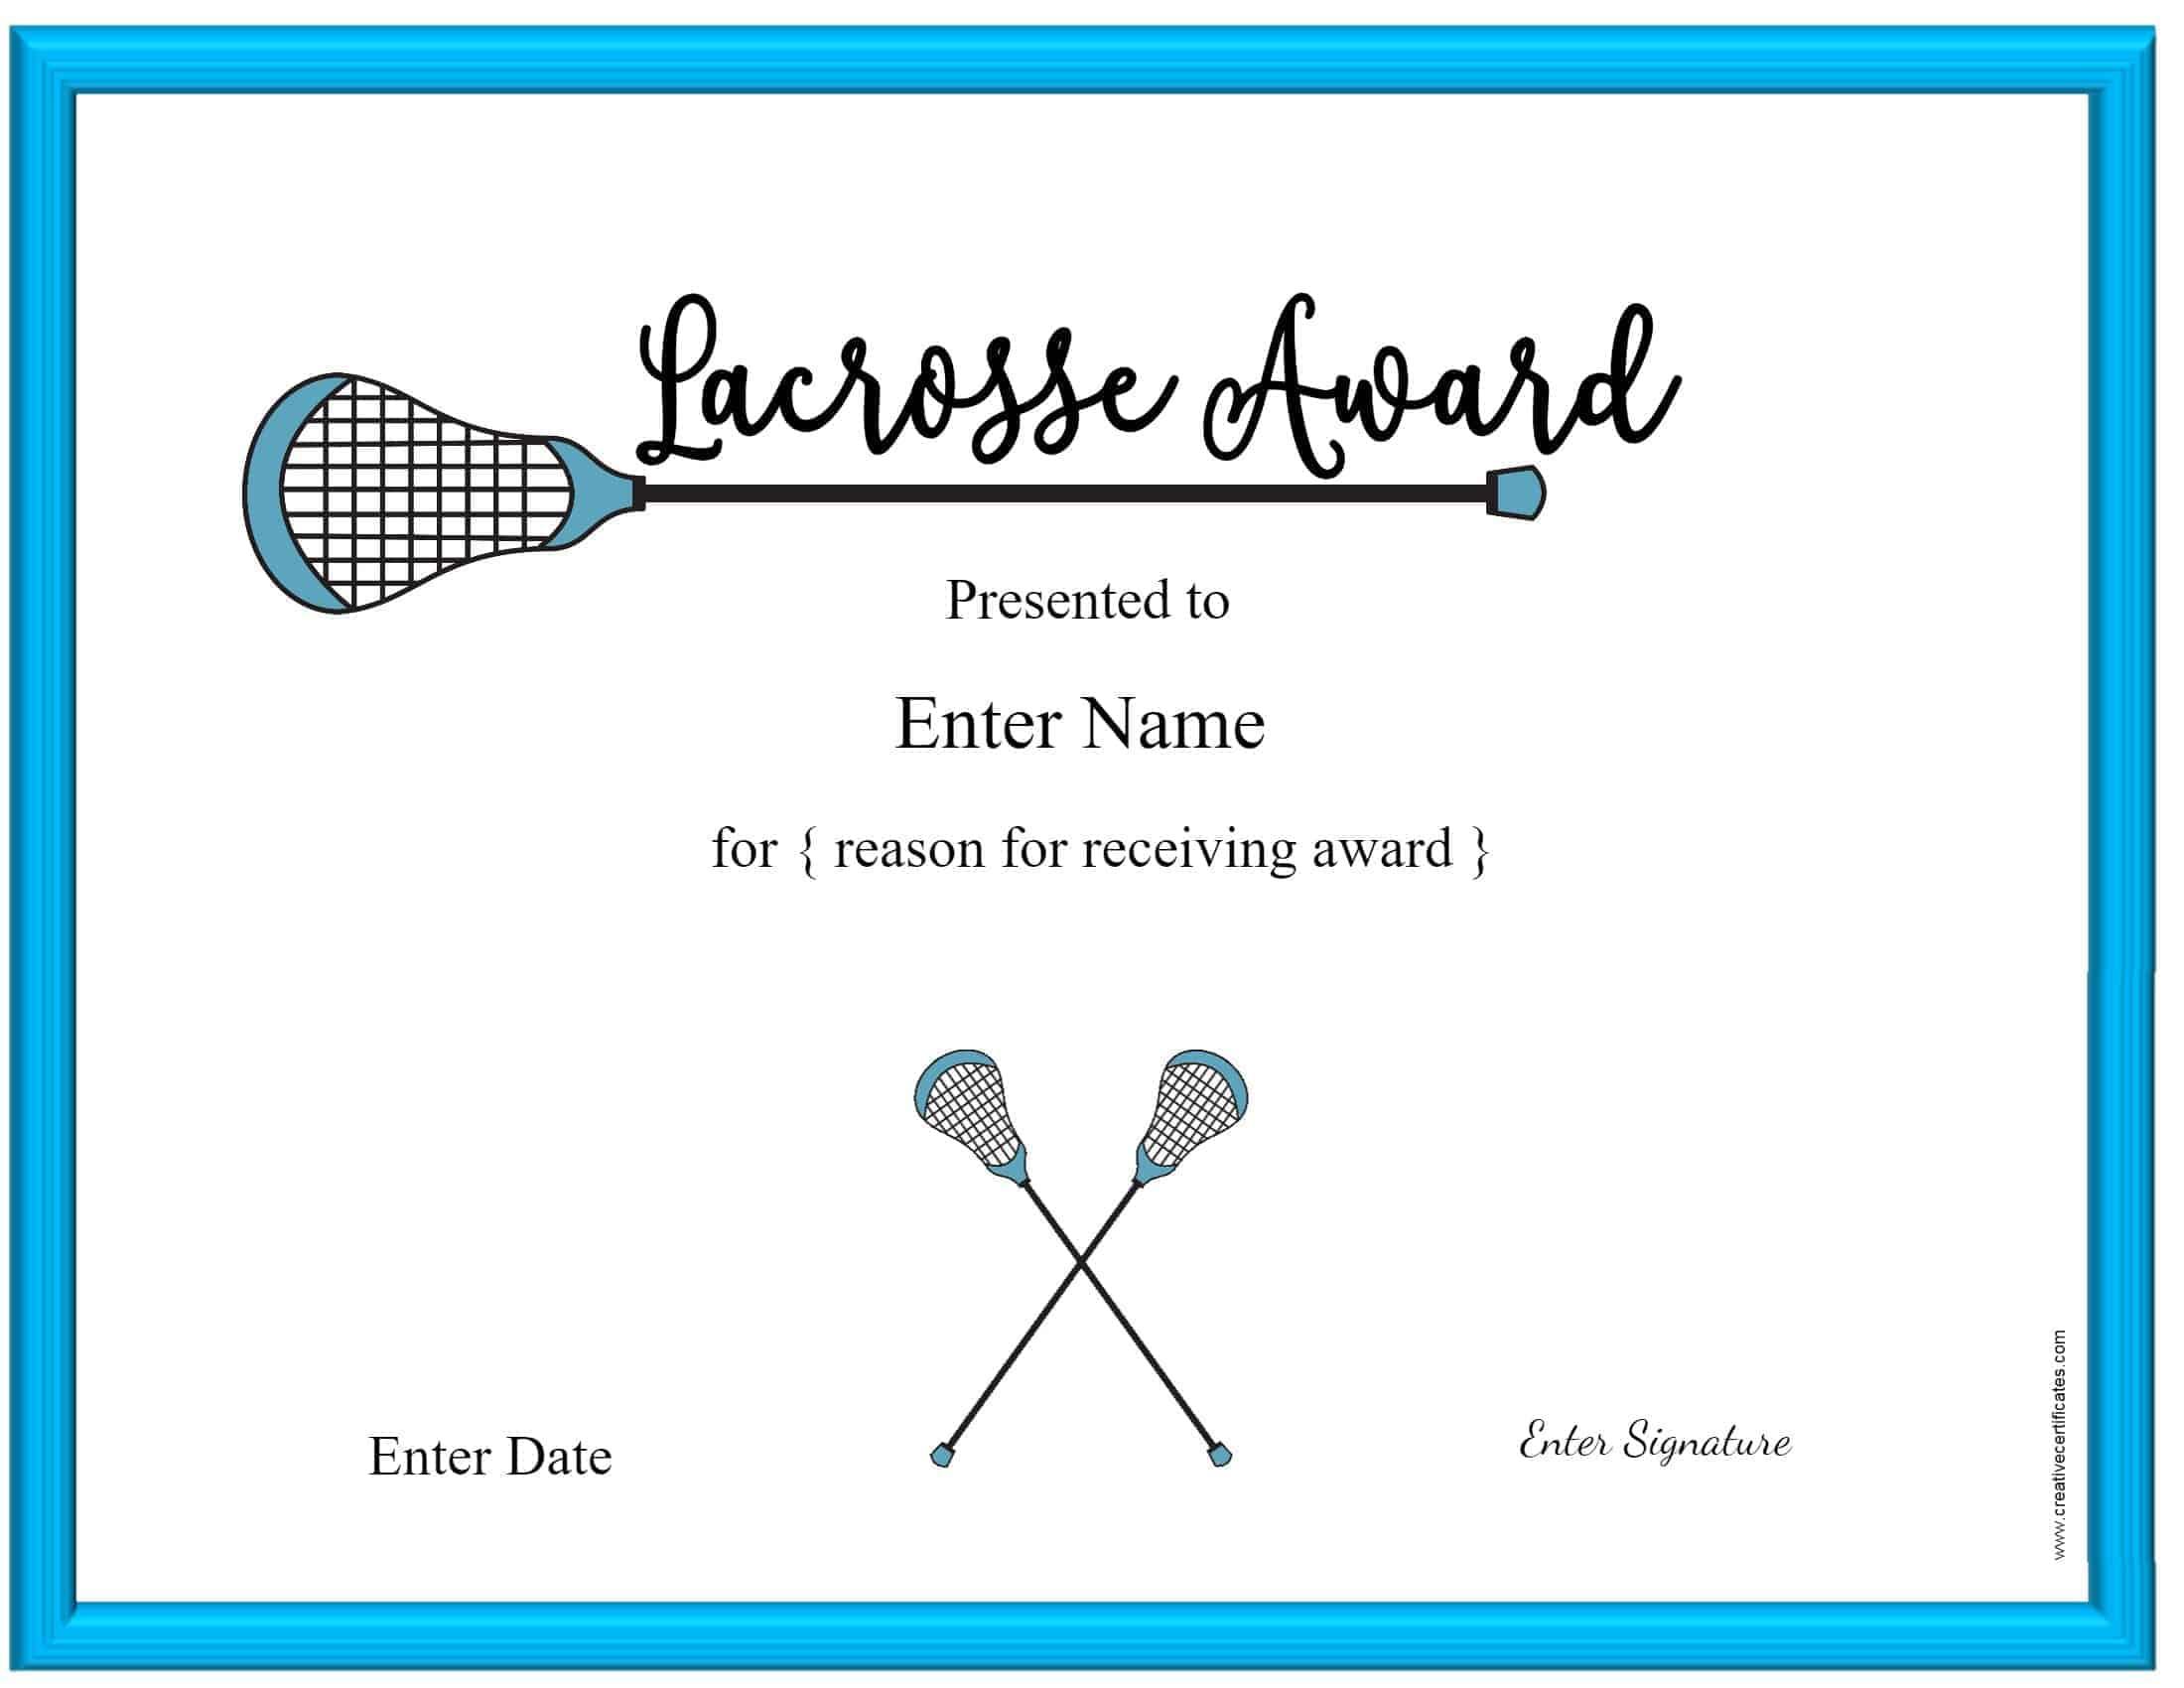 Lacrosse award certificate